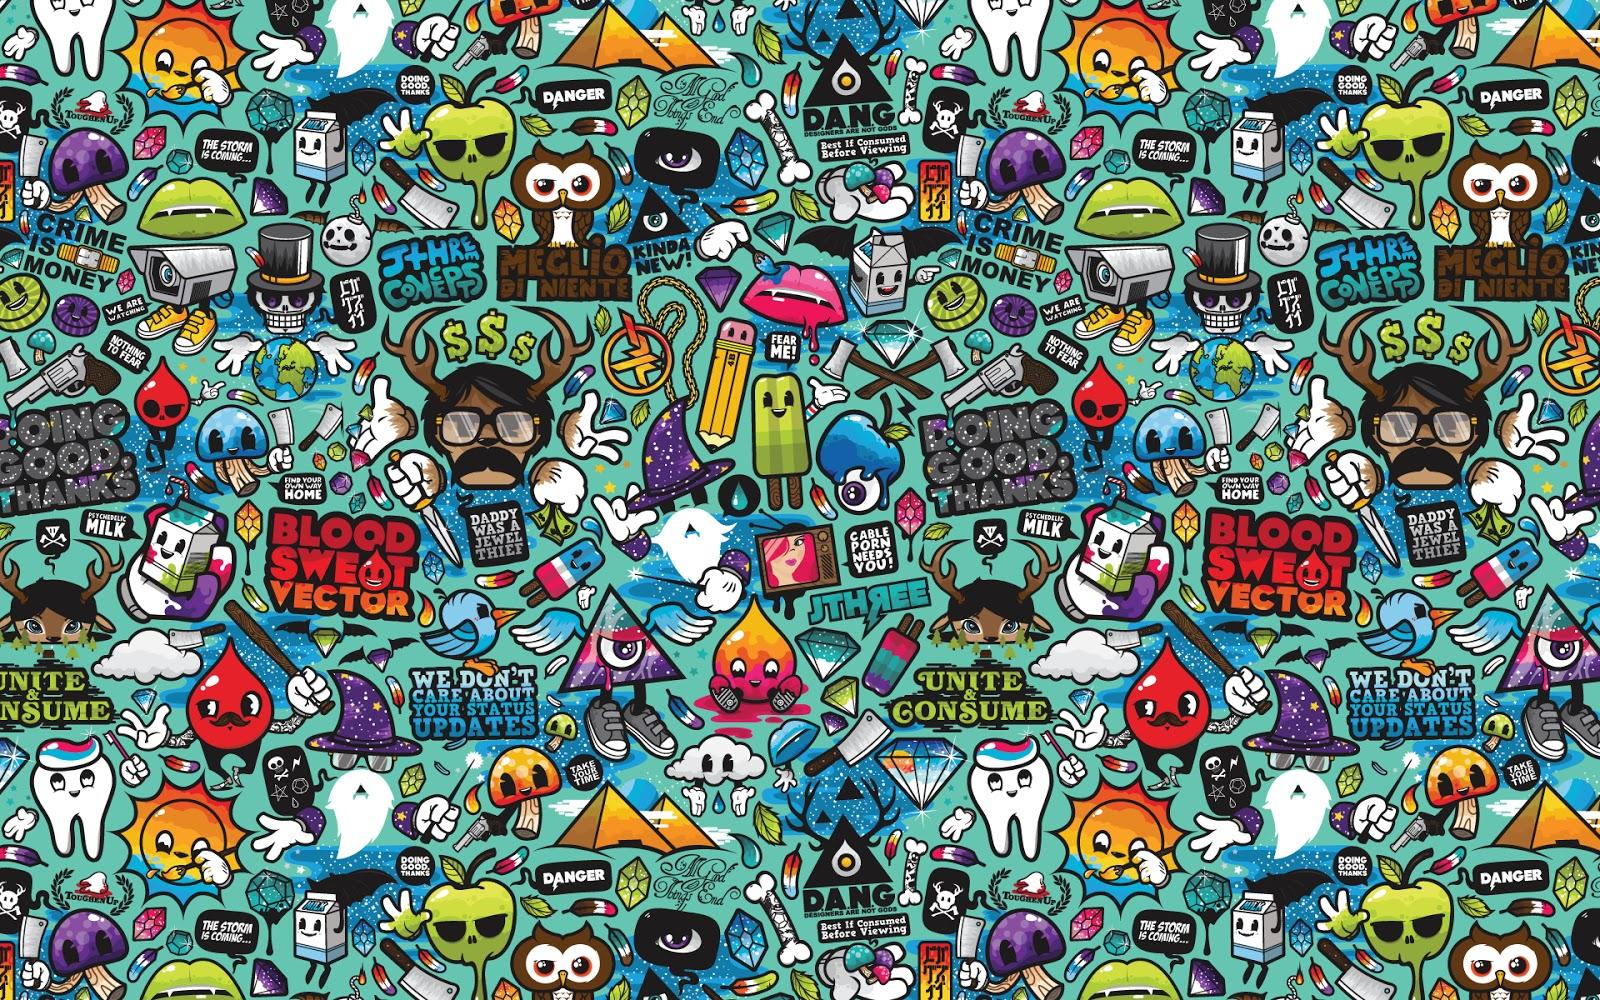 desktop wallpaper art fine - photo #33